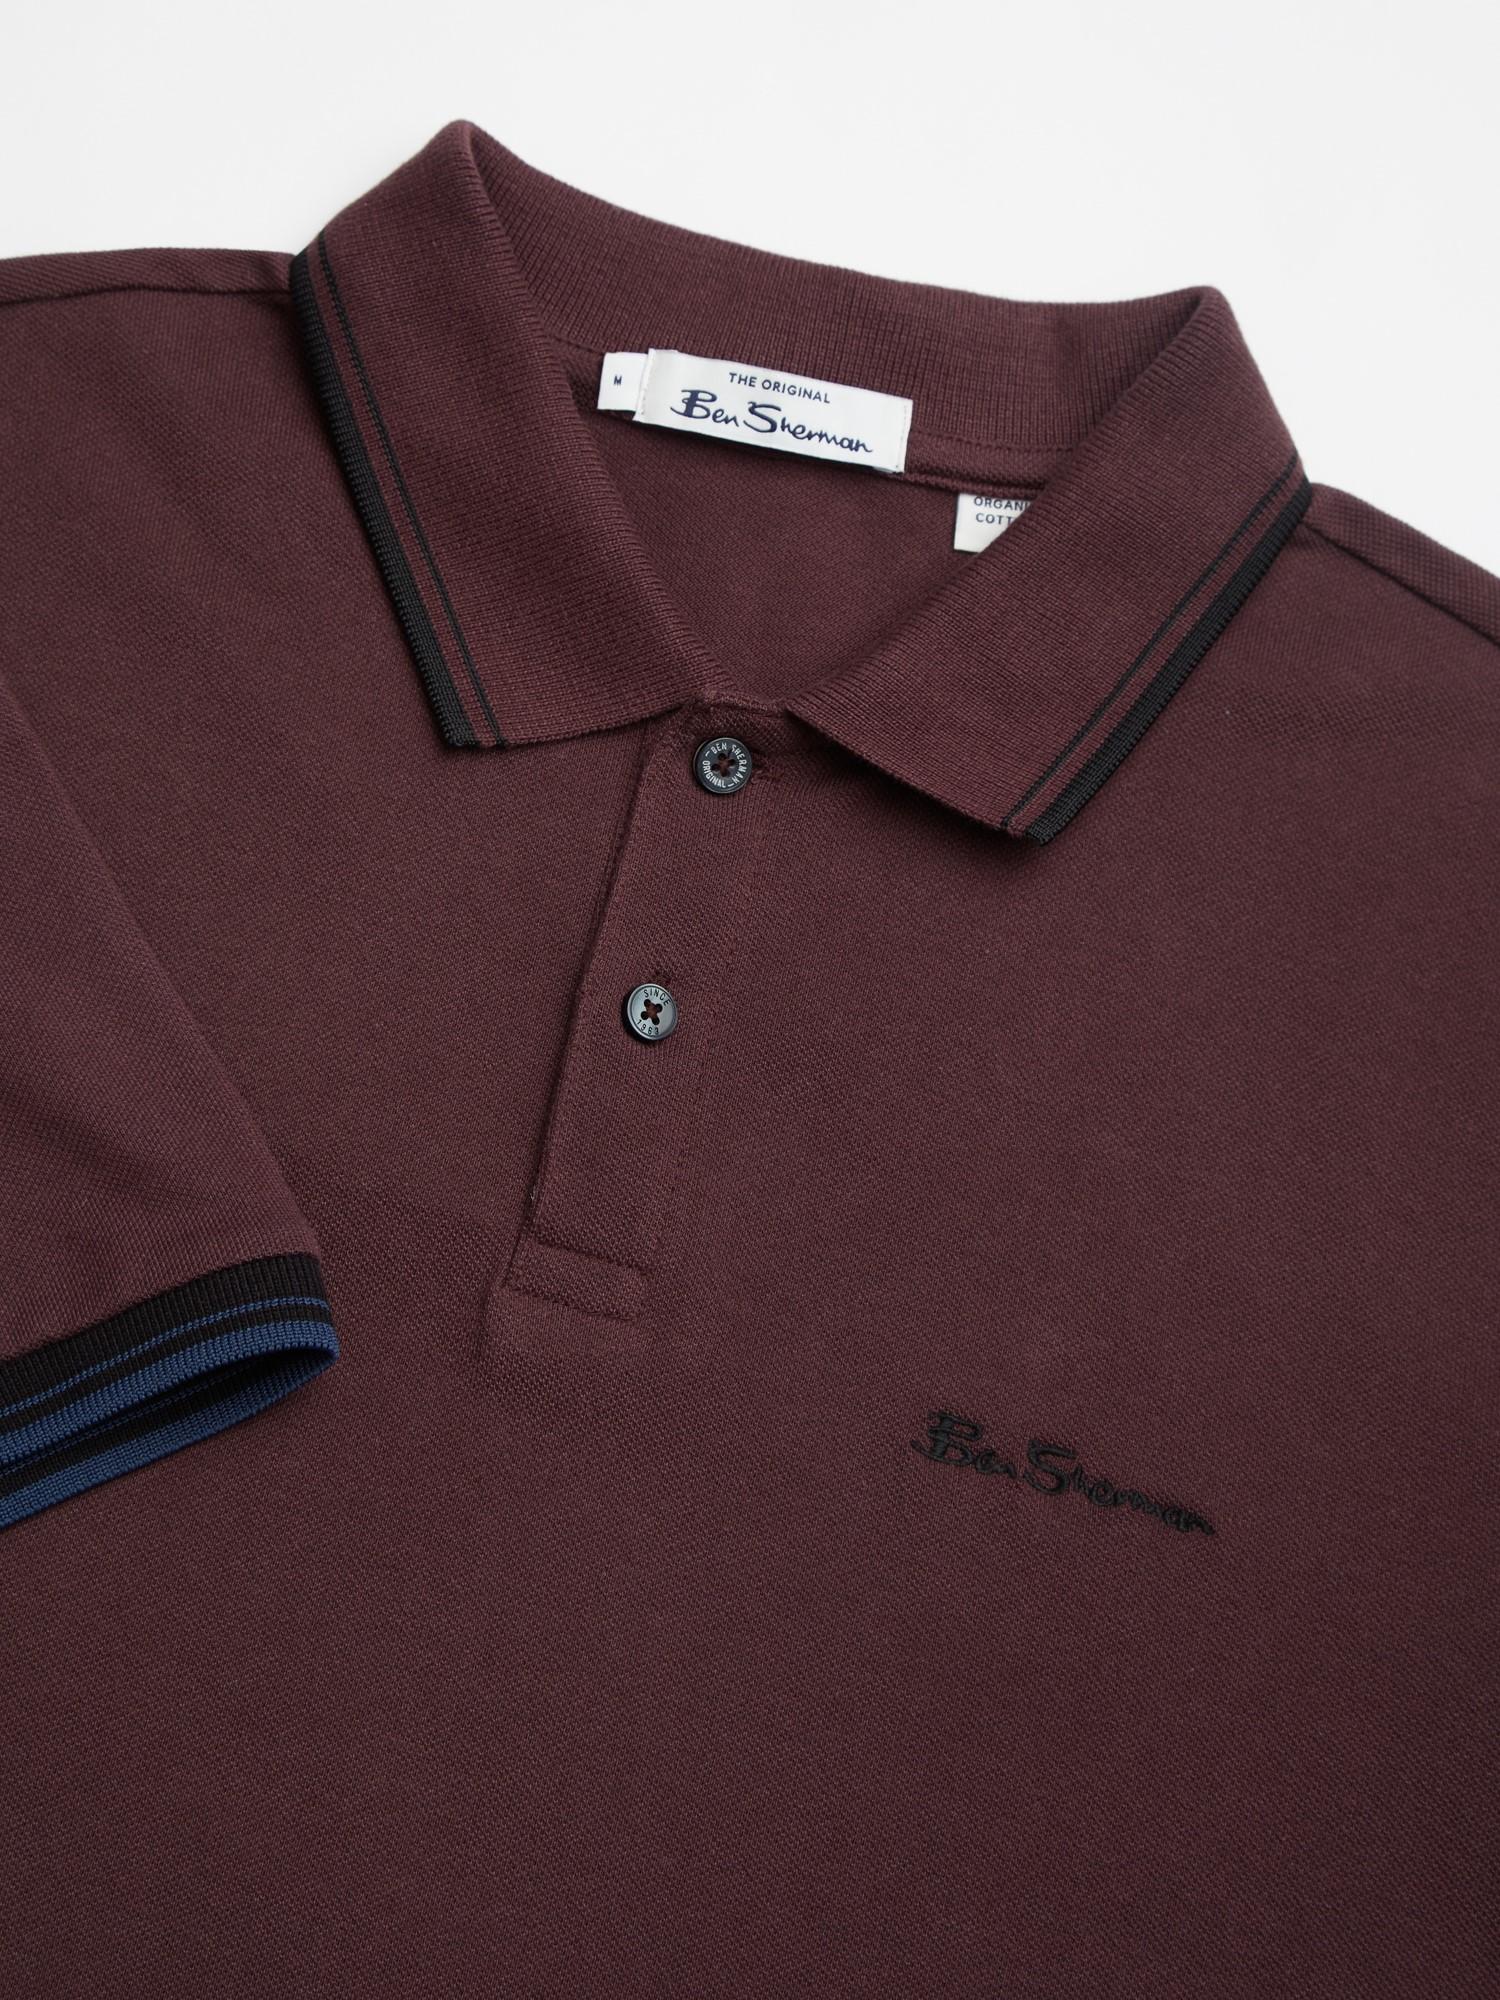 Bordeaux Signature Polo Shirt